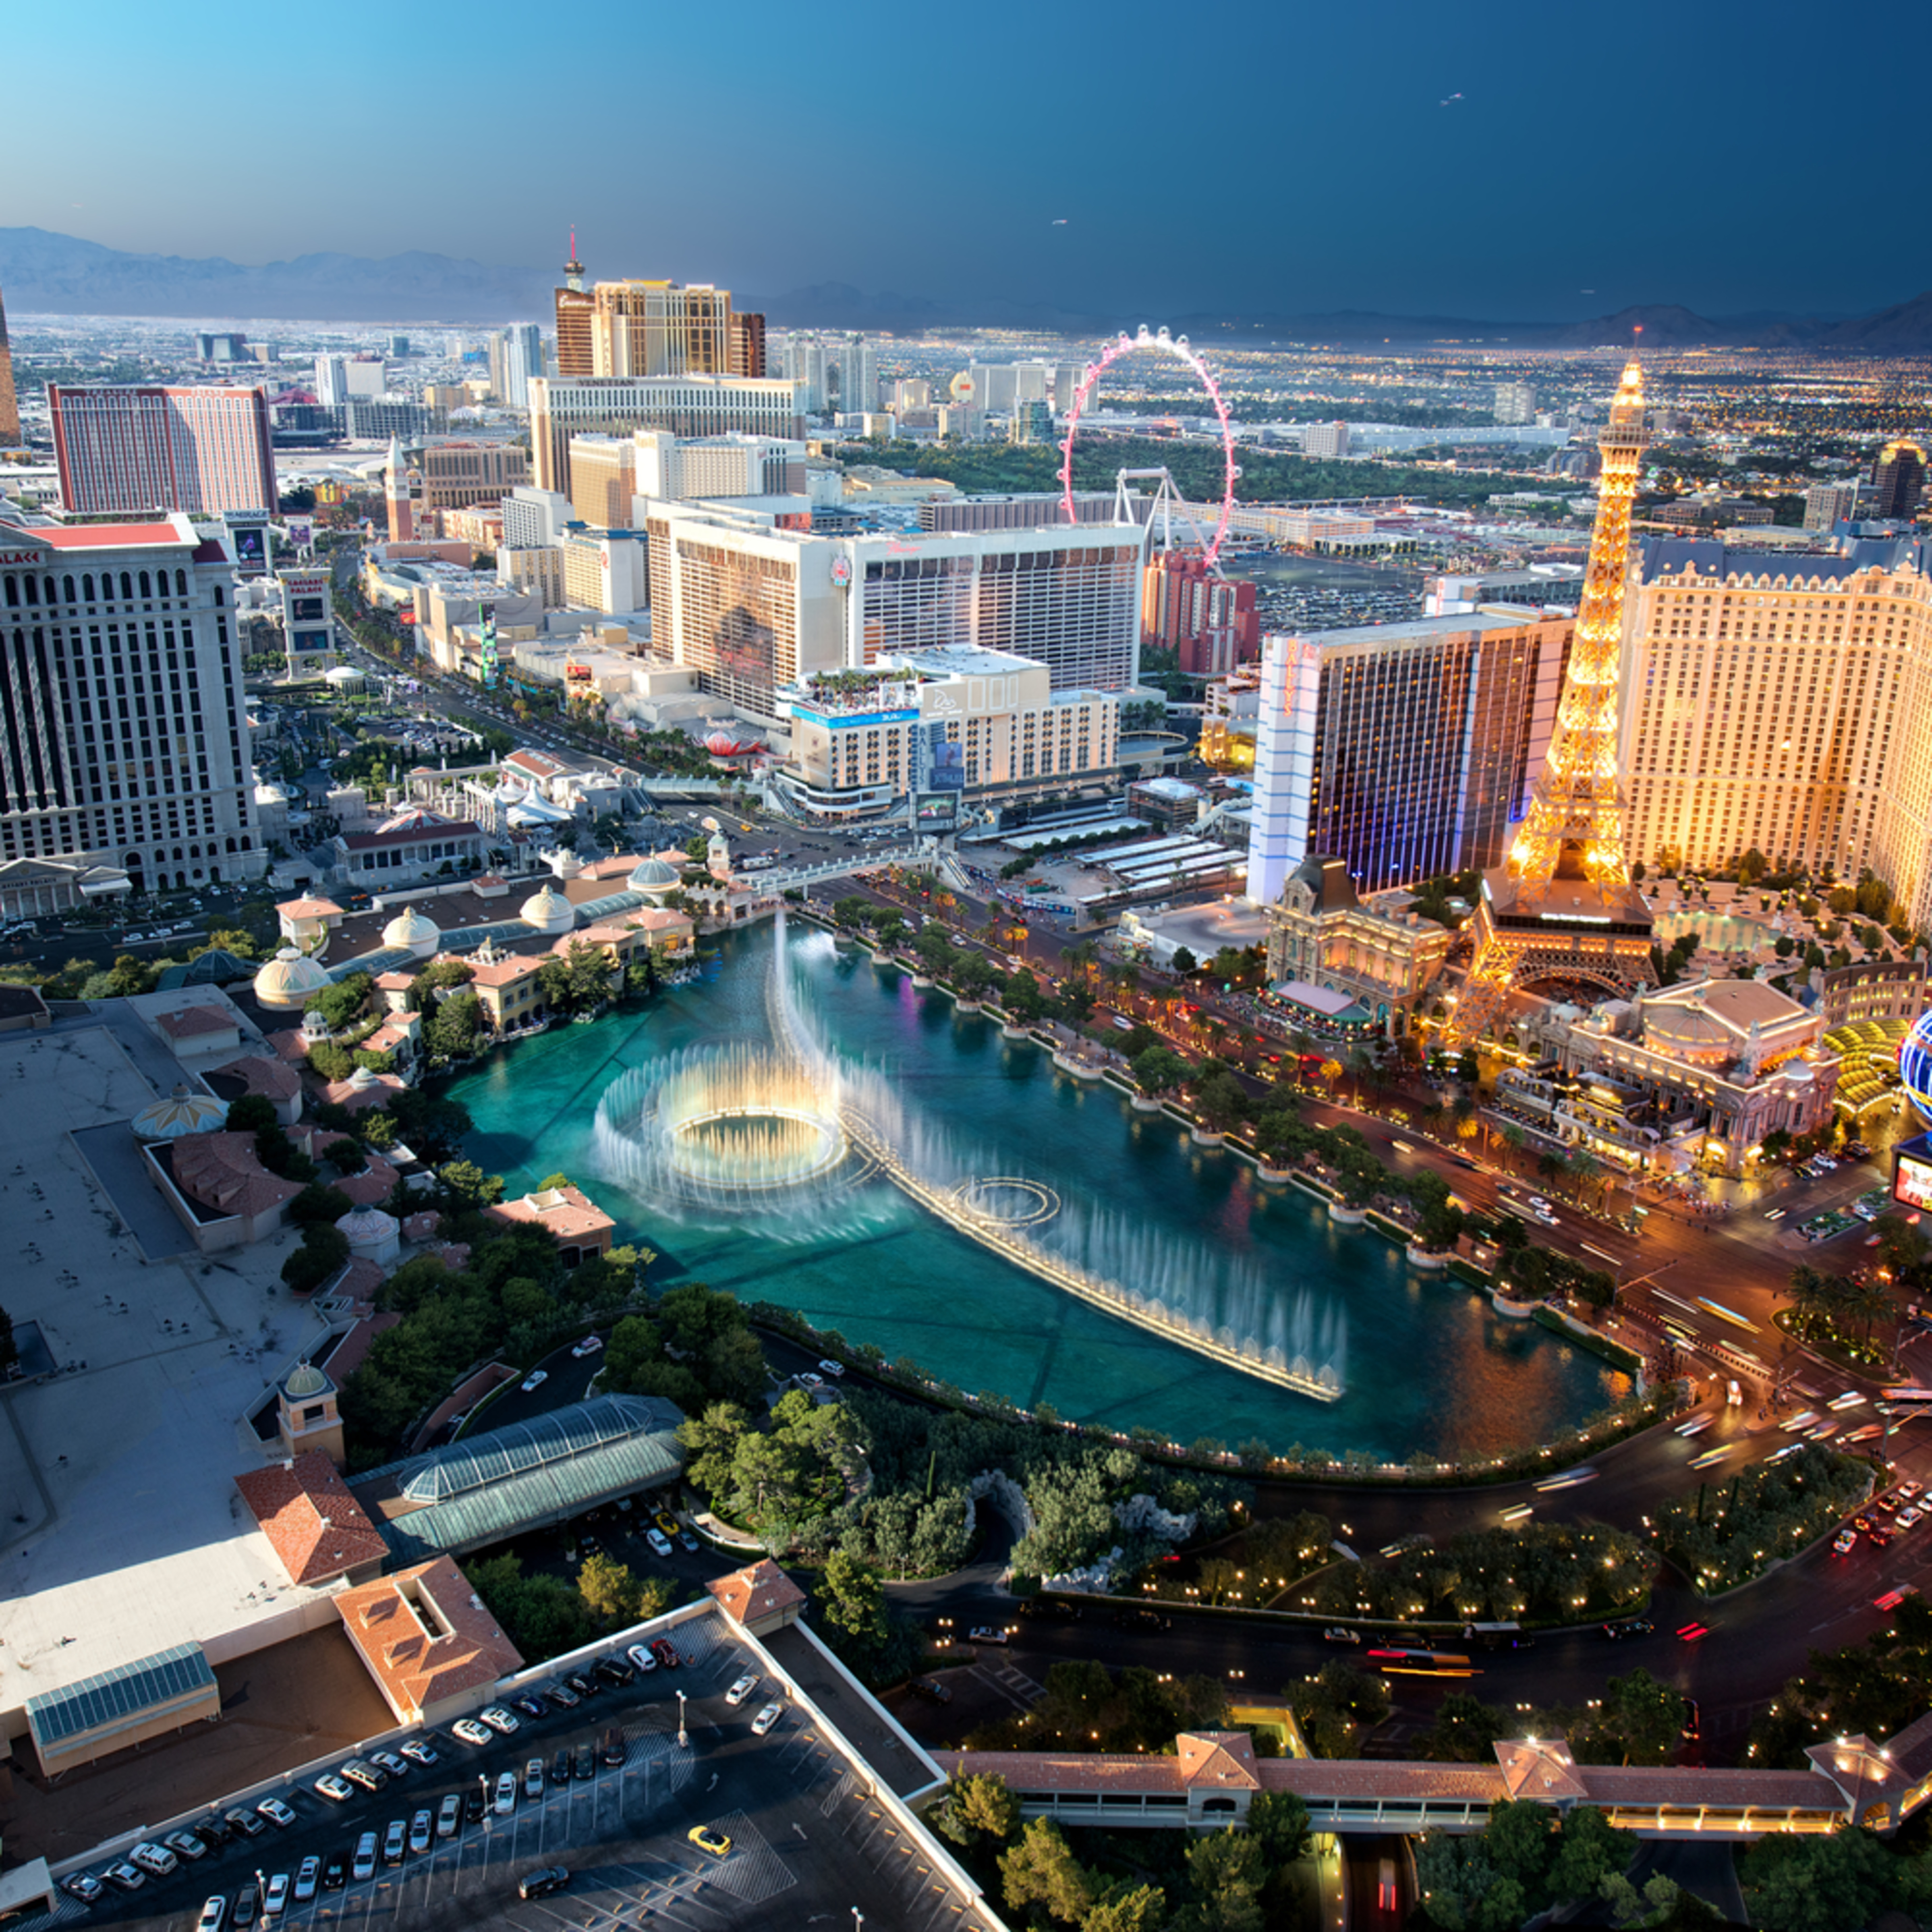 Vegassundown100 j0p0kz